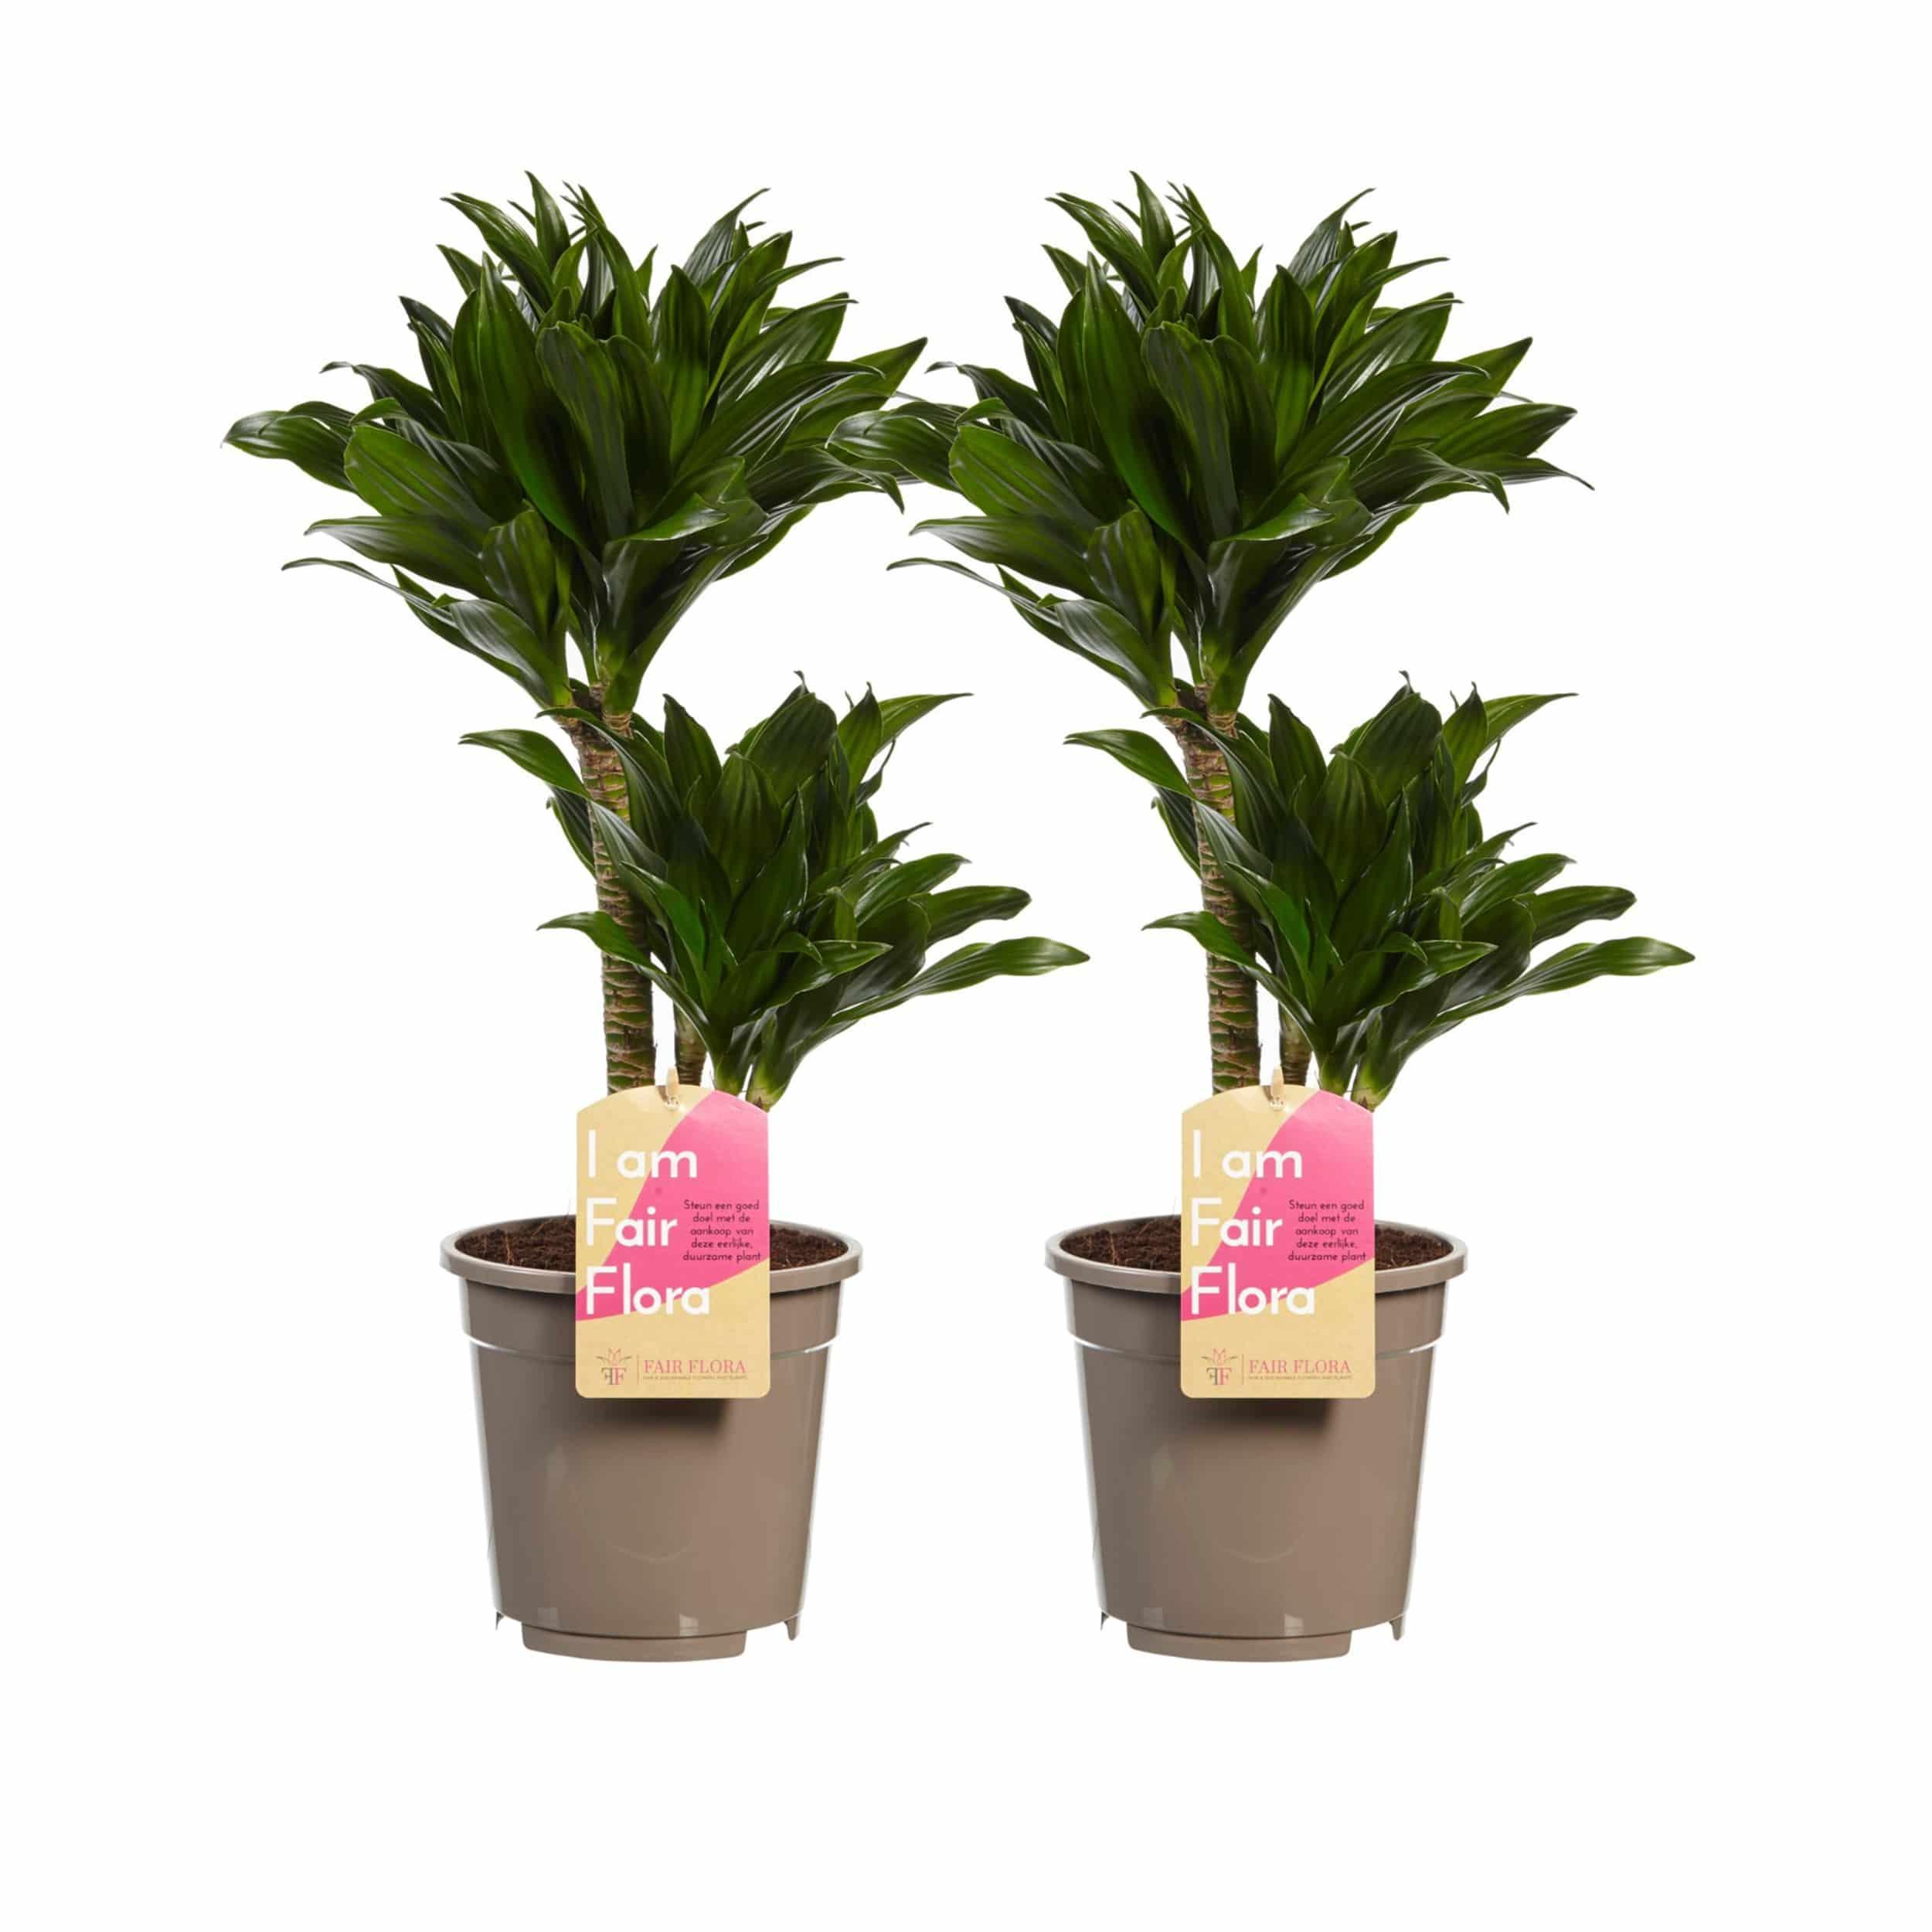 2er-Set Dracaena fragrans 'Compacta' - Drachenbaum